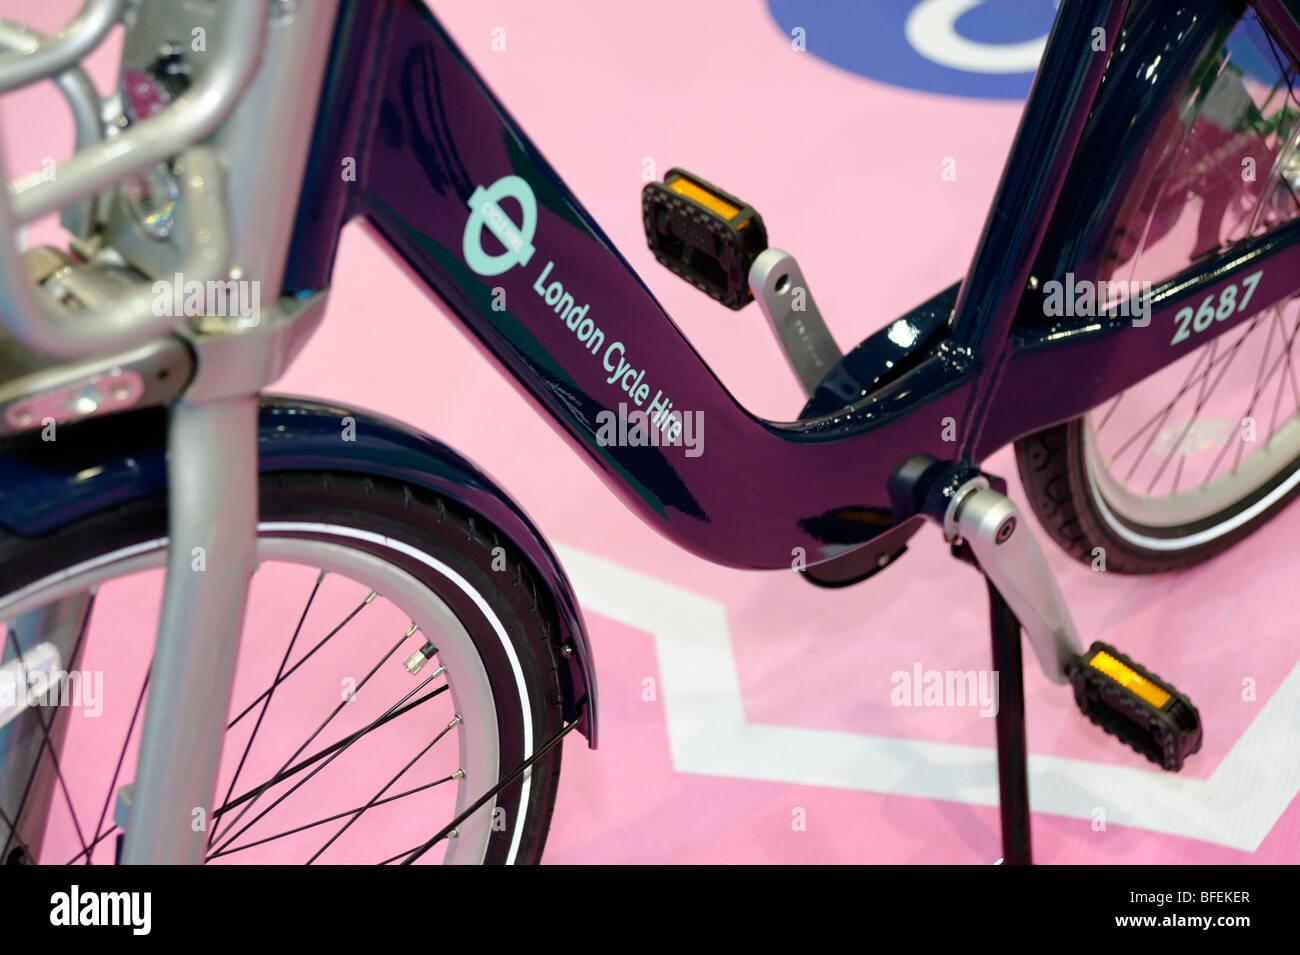 TFL Bicicletas bicicleta, bicicletas públicas plan de reparto que se lanzarán en Londres 2010. Mostrar Imagen De Stock